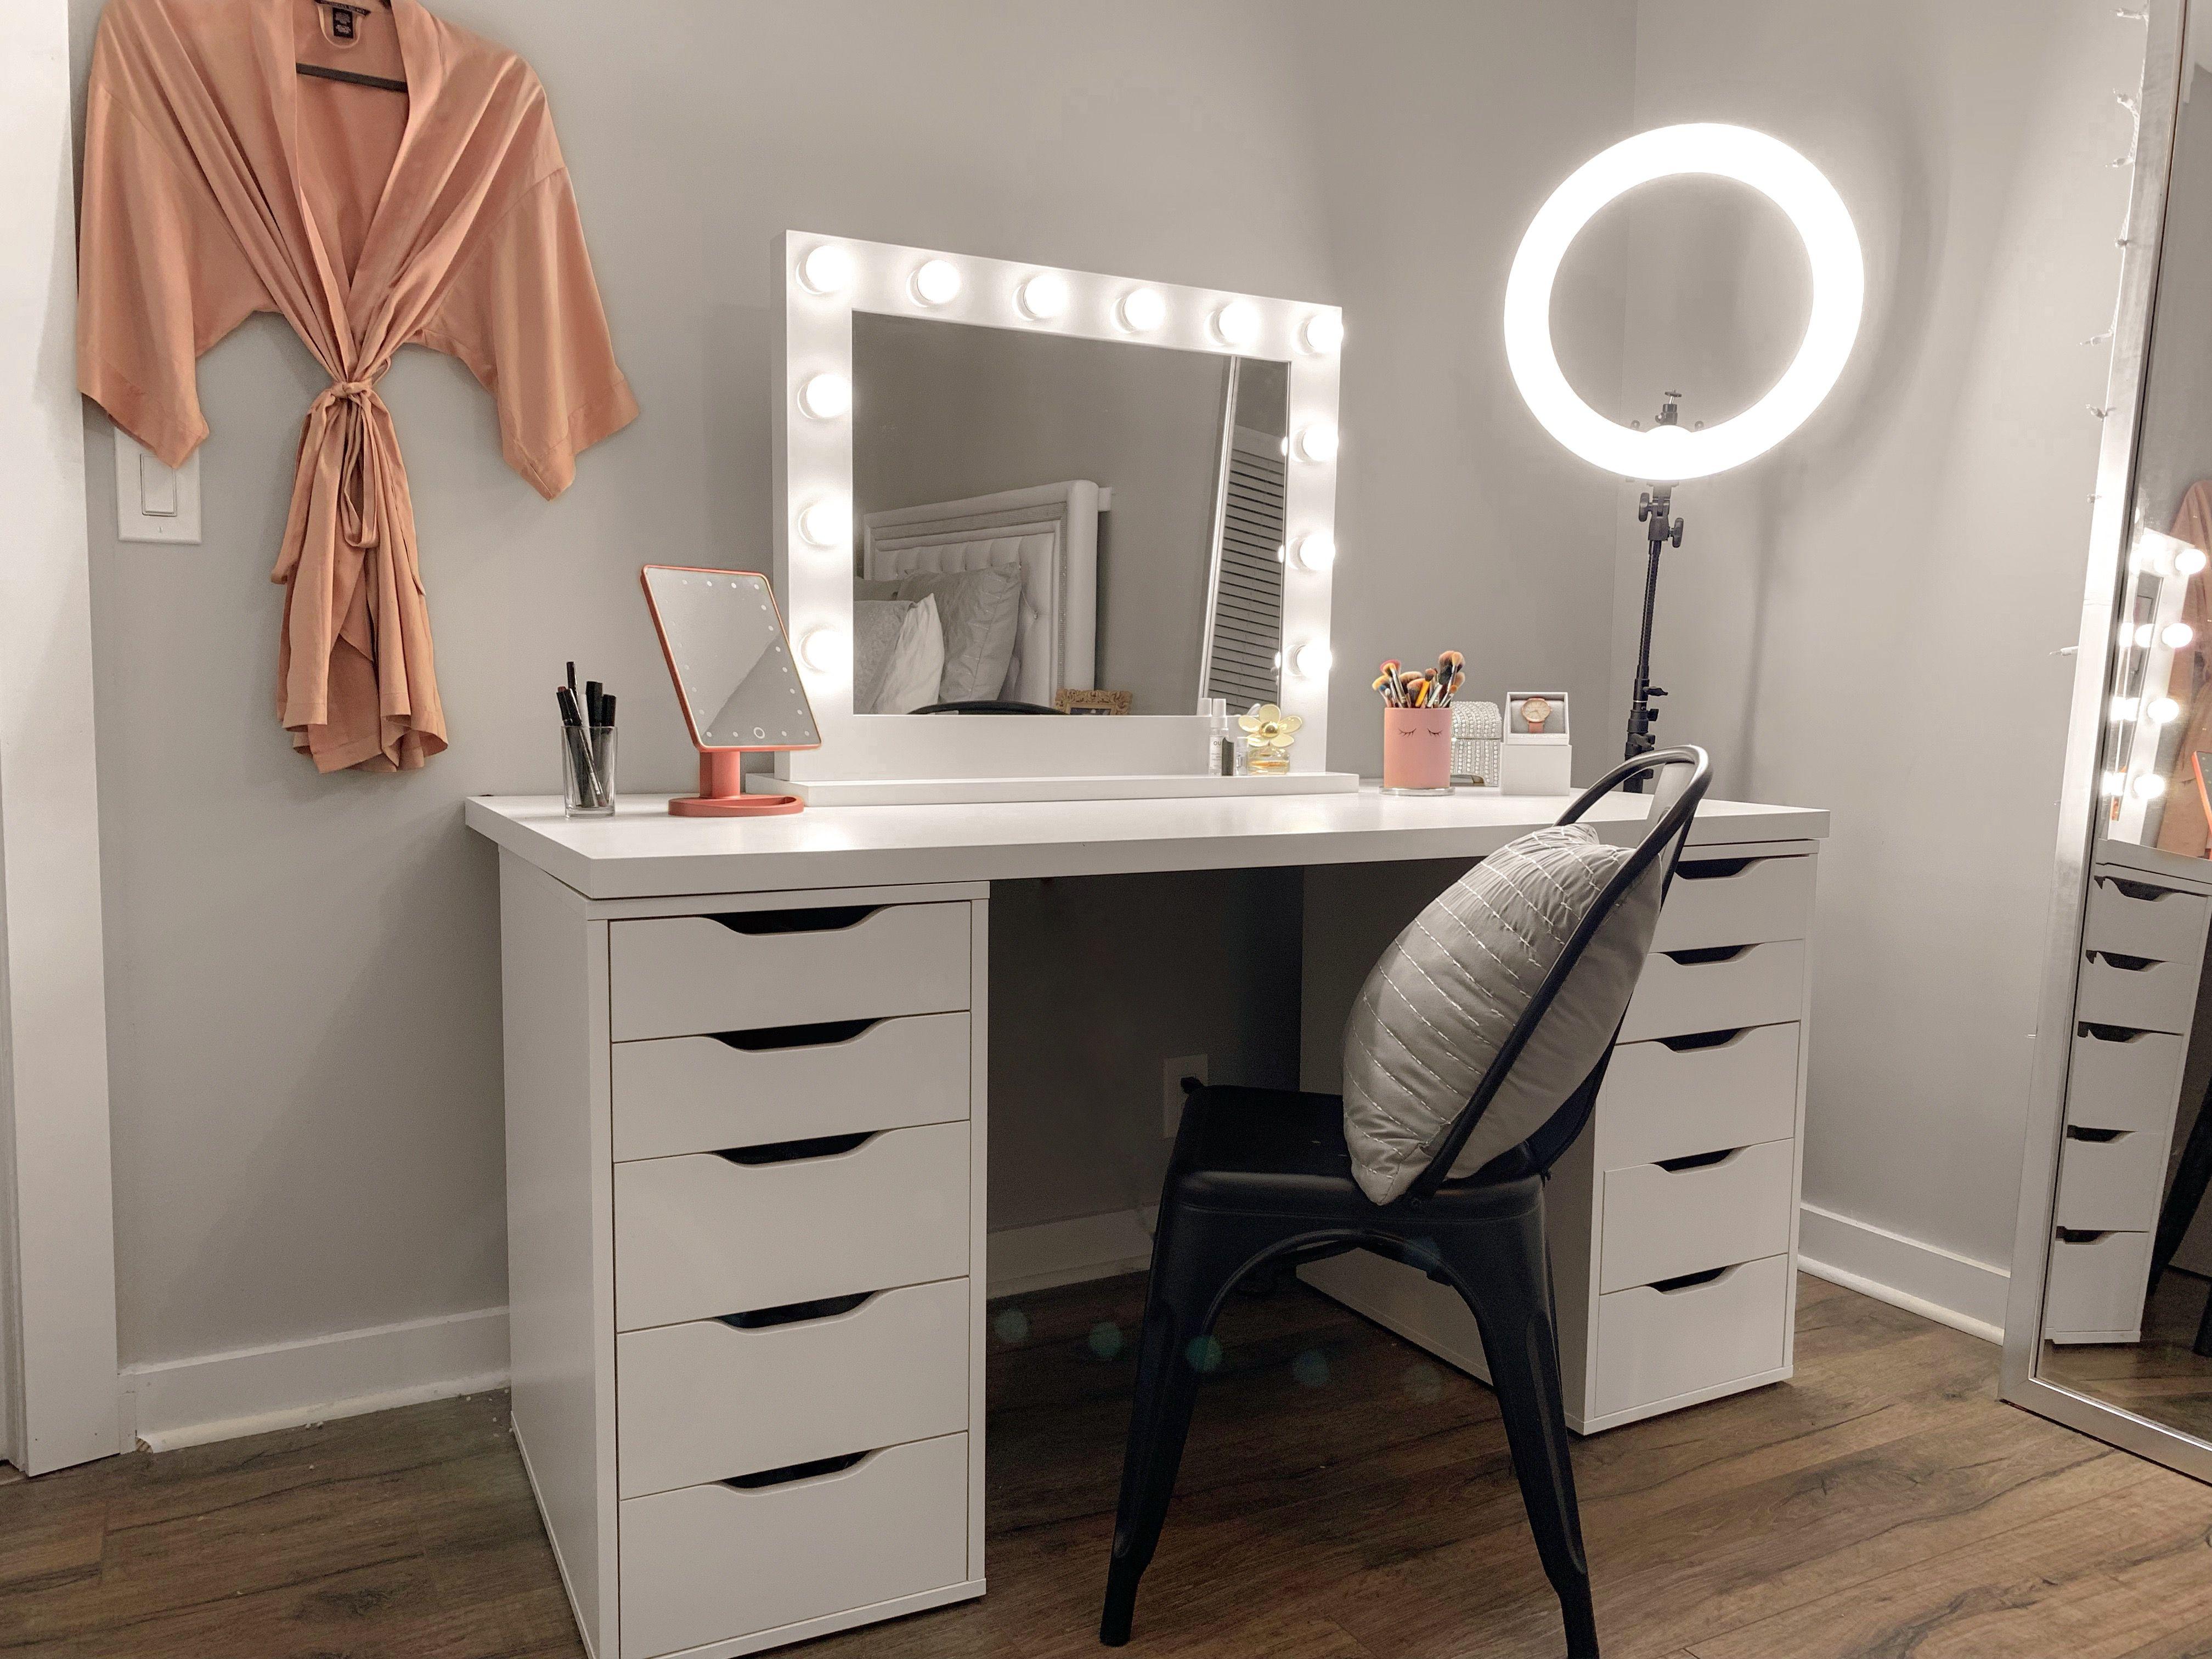 ikea vanity. ring light. makeup. Vanity set up, Vanity